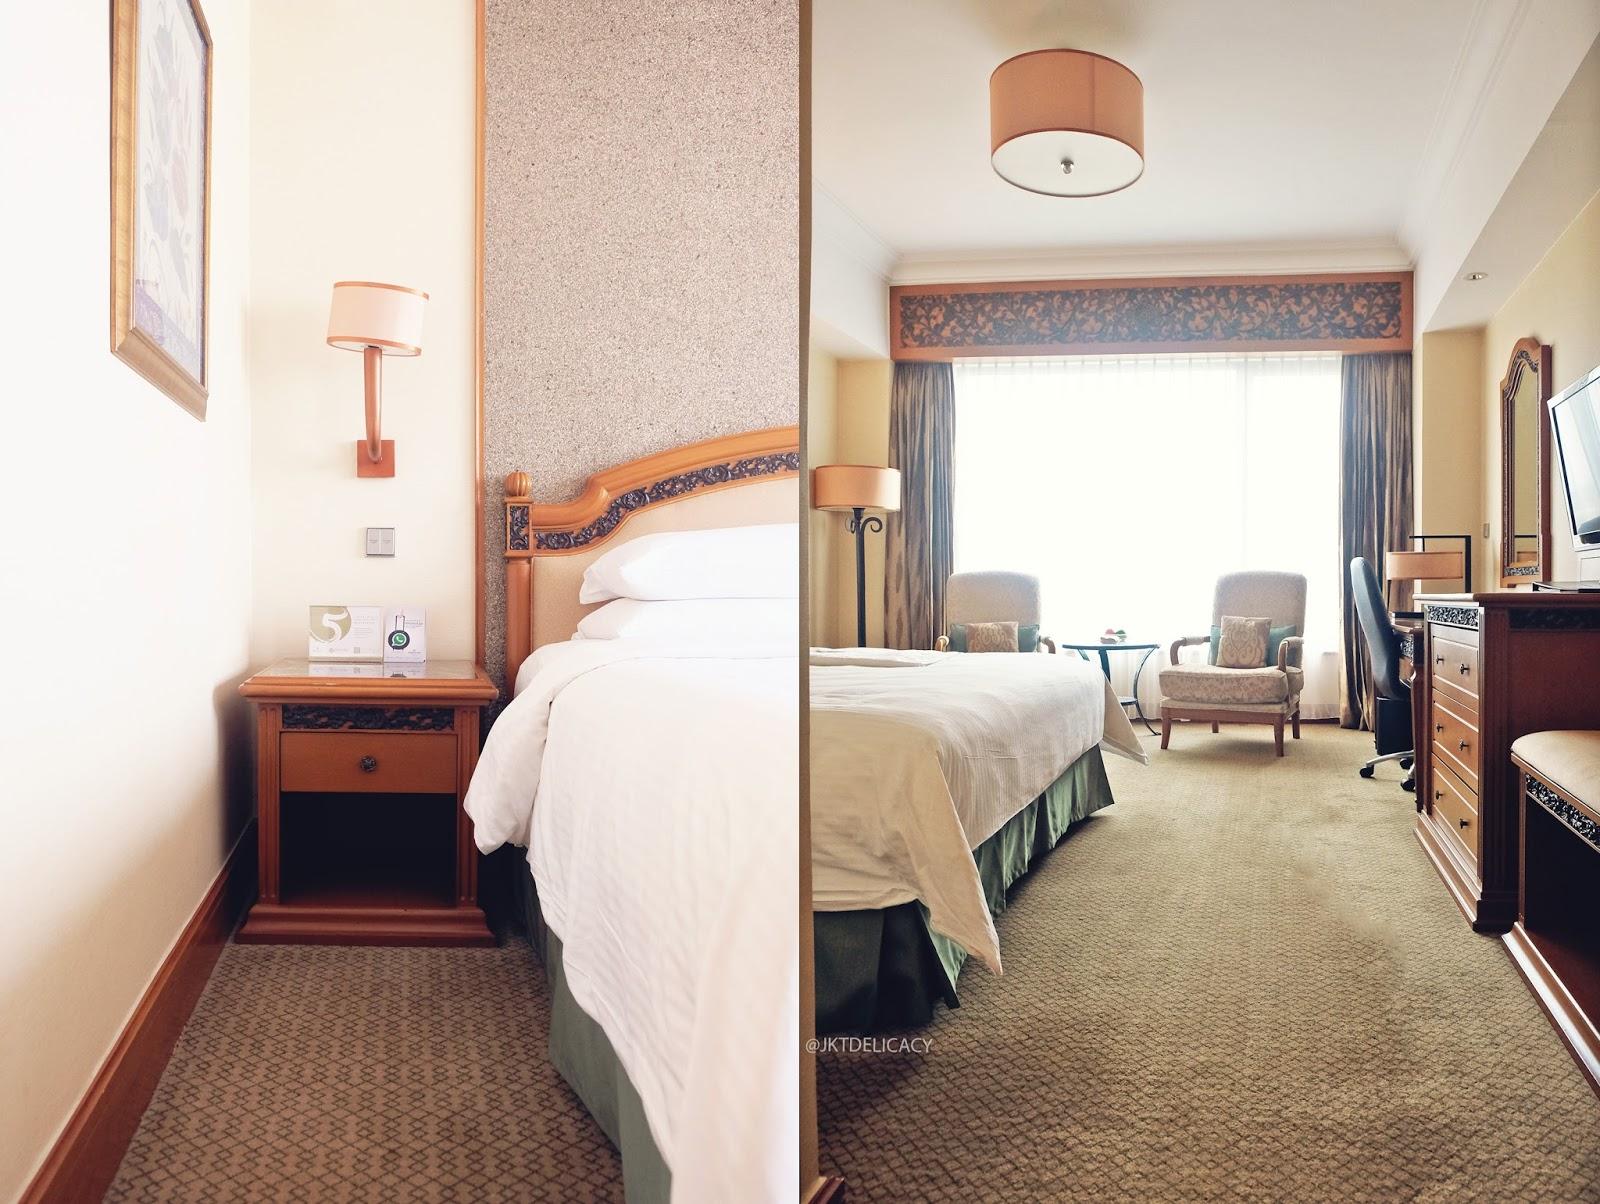 Jktdelicacy Com Staycation At Shangri La Hotel Surabaya